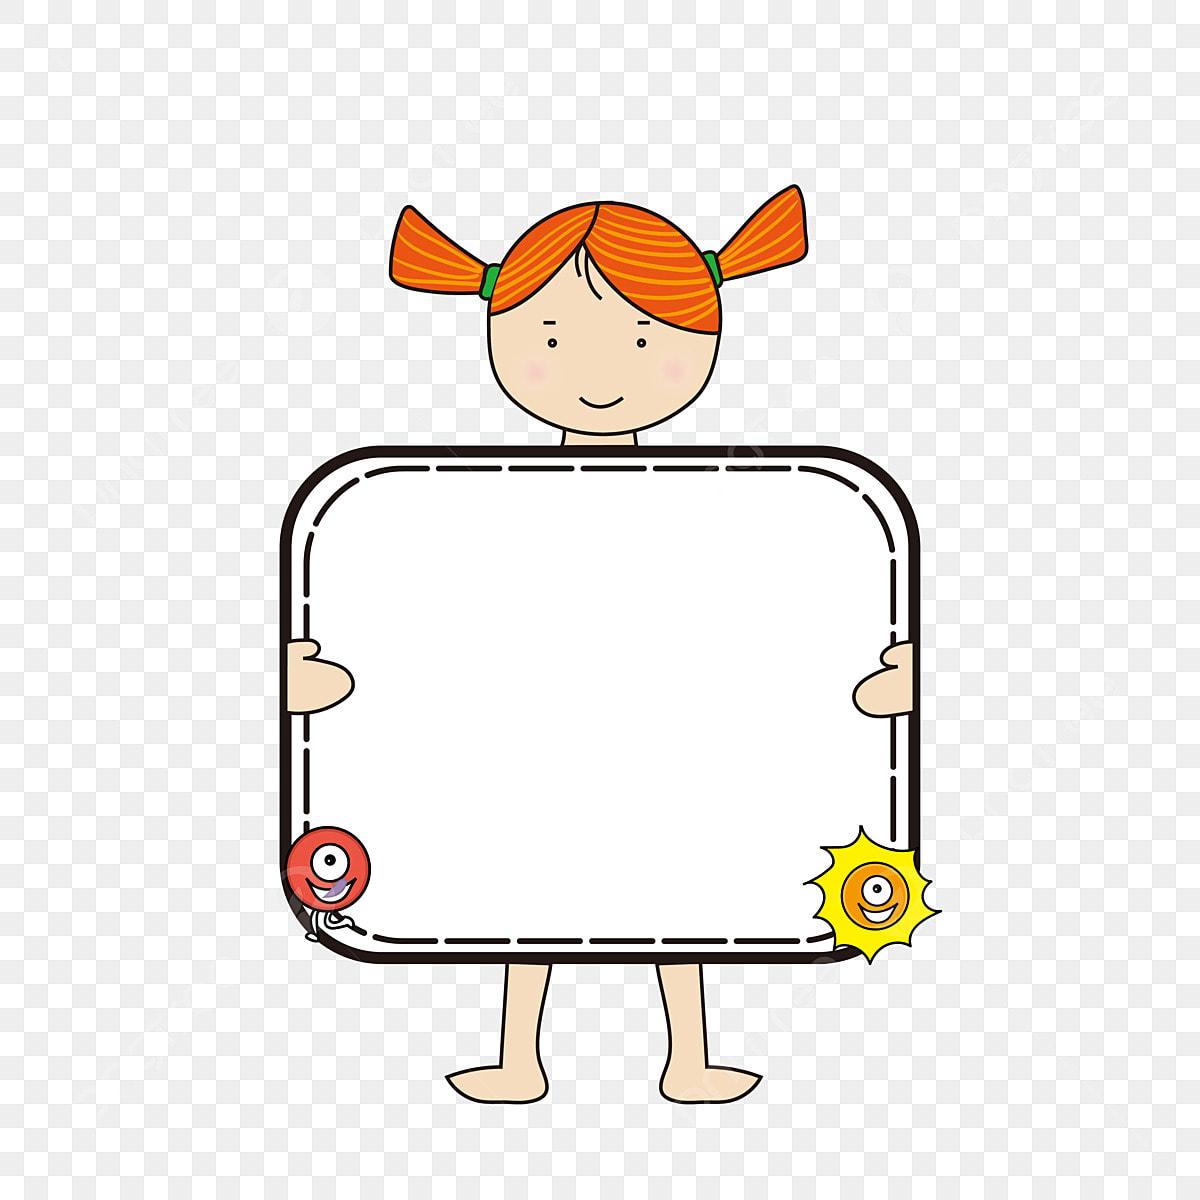 Huruf Kartun Dengan Gadis Kecil Memegang Sketsa Kartun